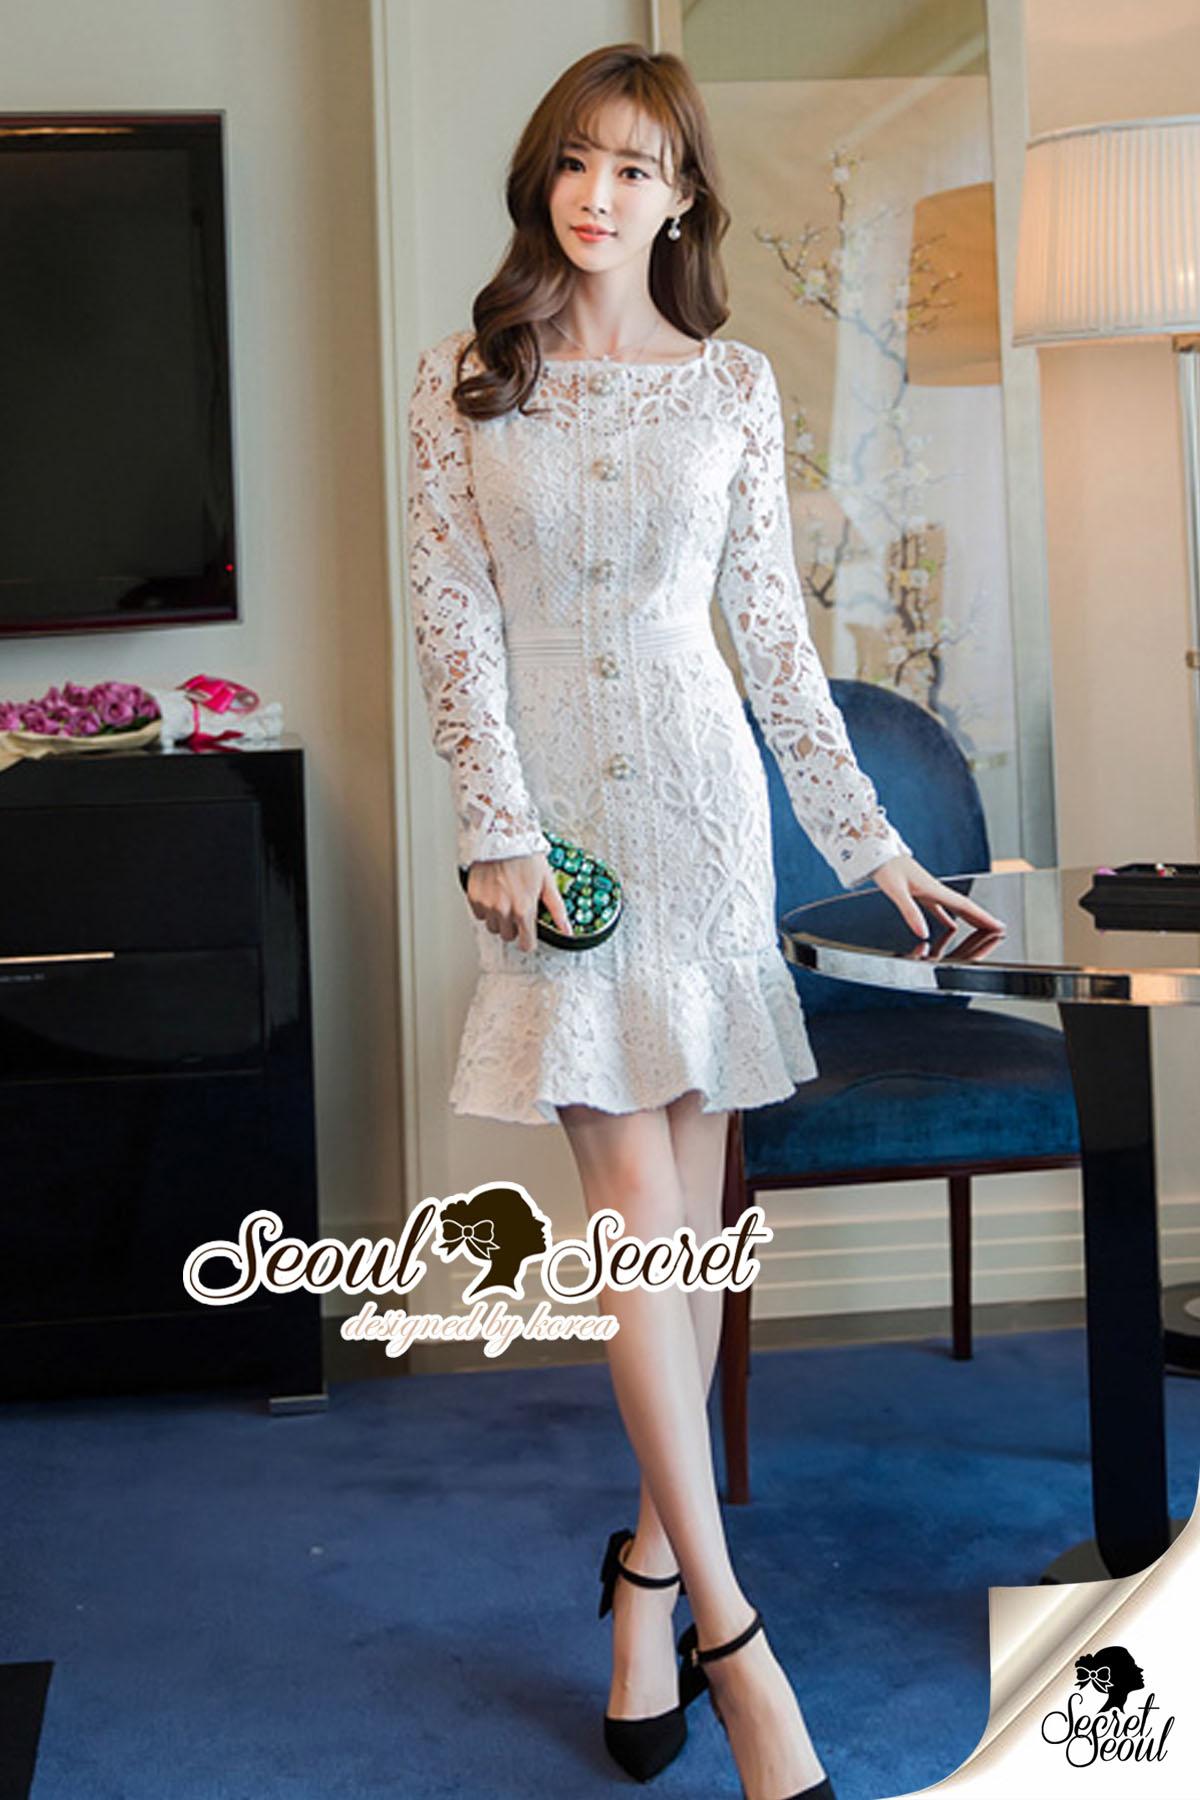 Seoul Secret Say's... Princess Ladiest Ivory Lace Dress